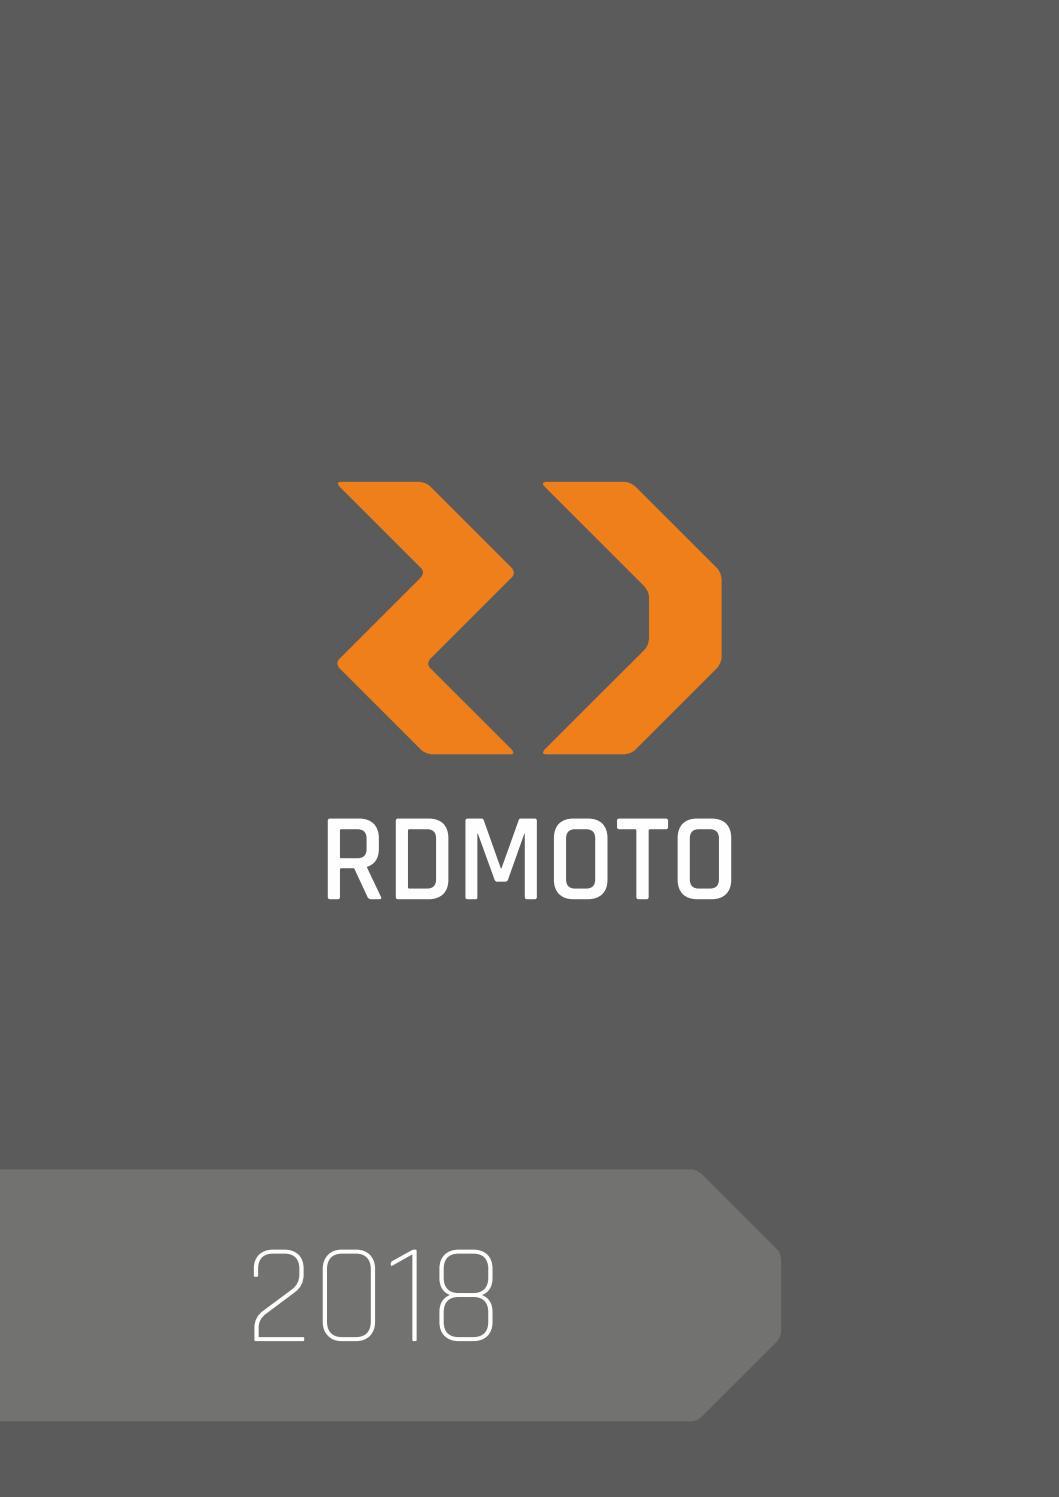 Rdmoto Catalogo 2018 By Faster96 Srl Issuu